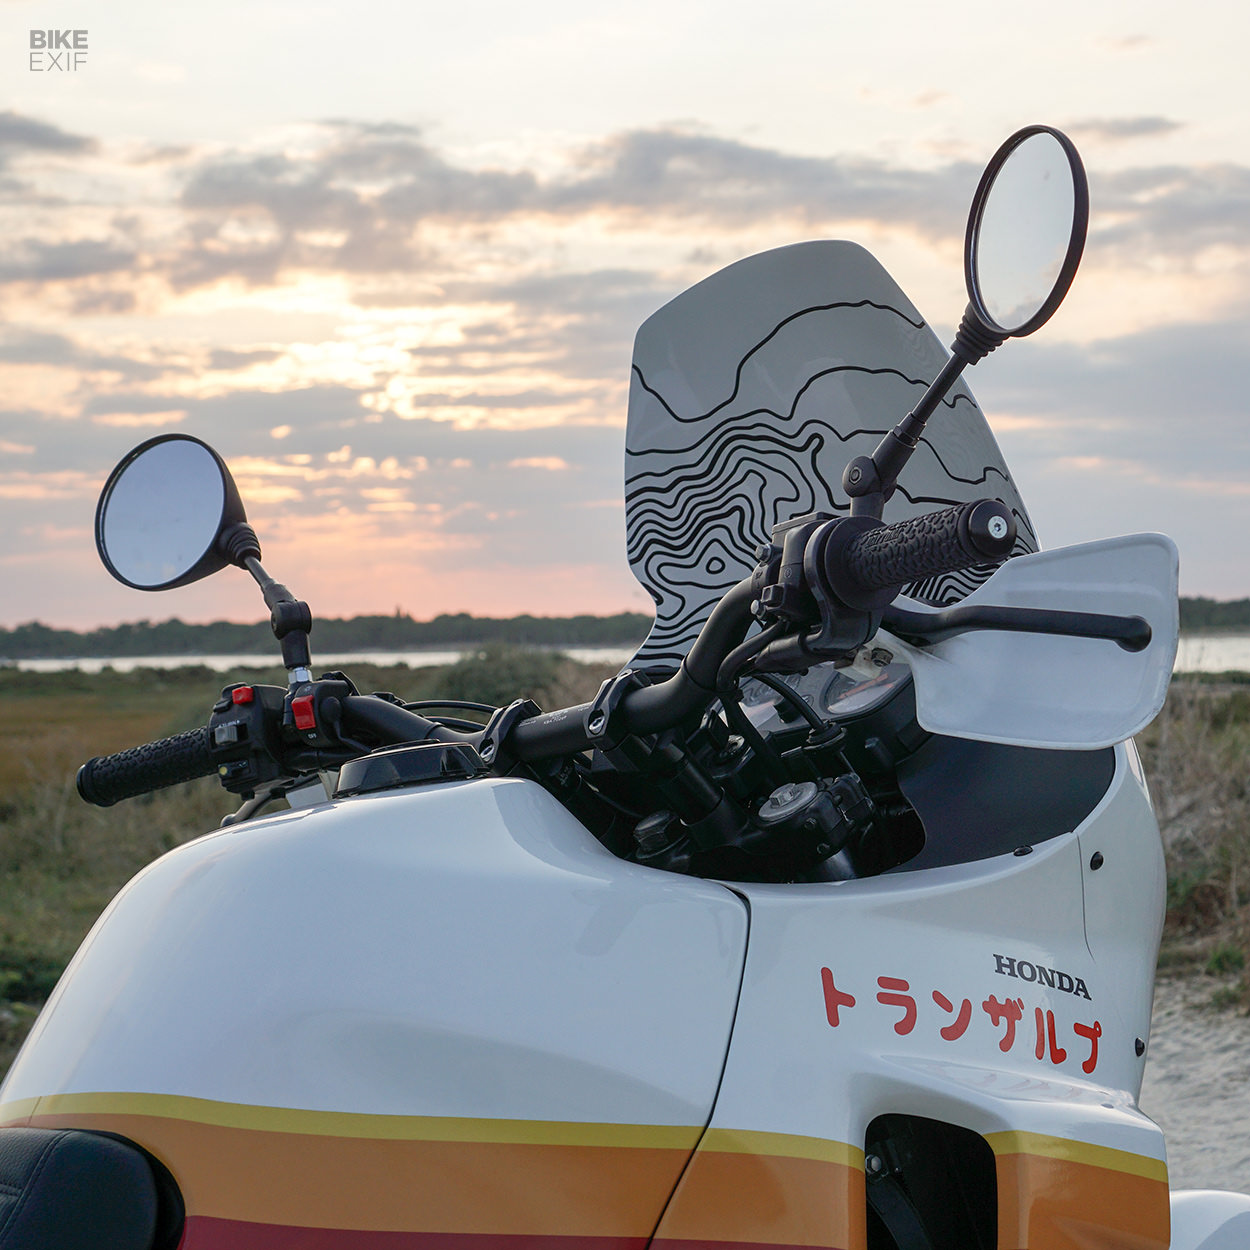 1987 Honda Transalp adventure bike by Viba